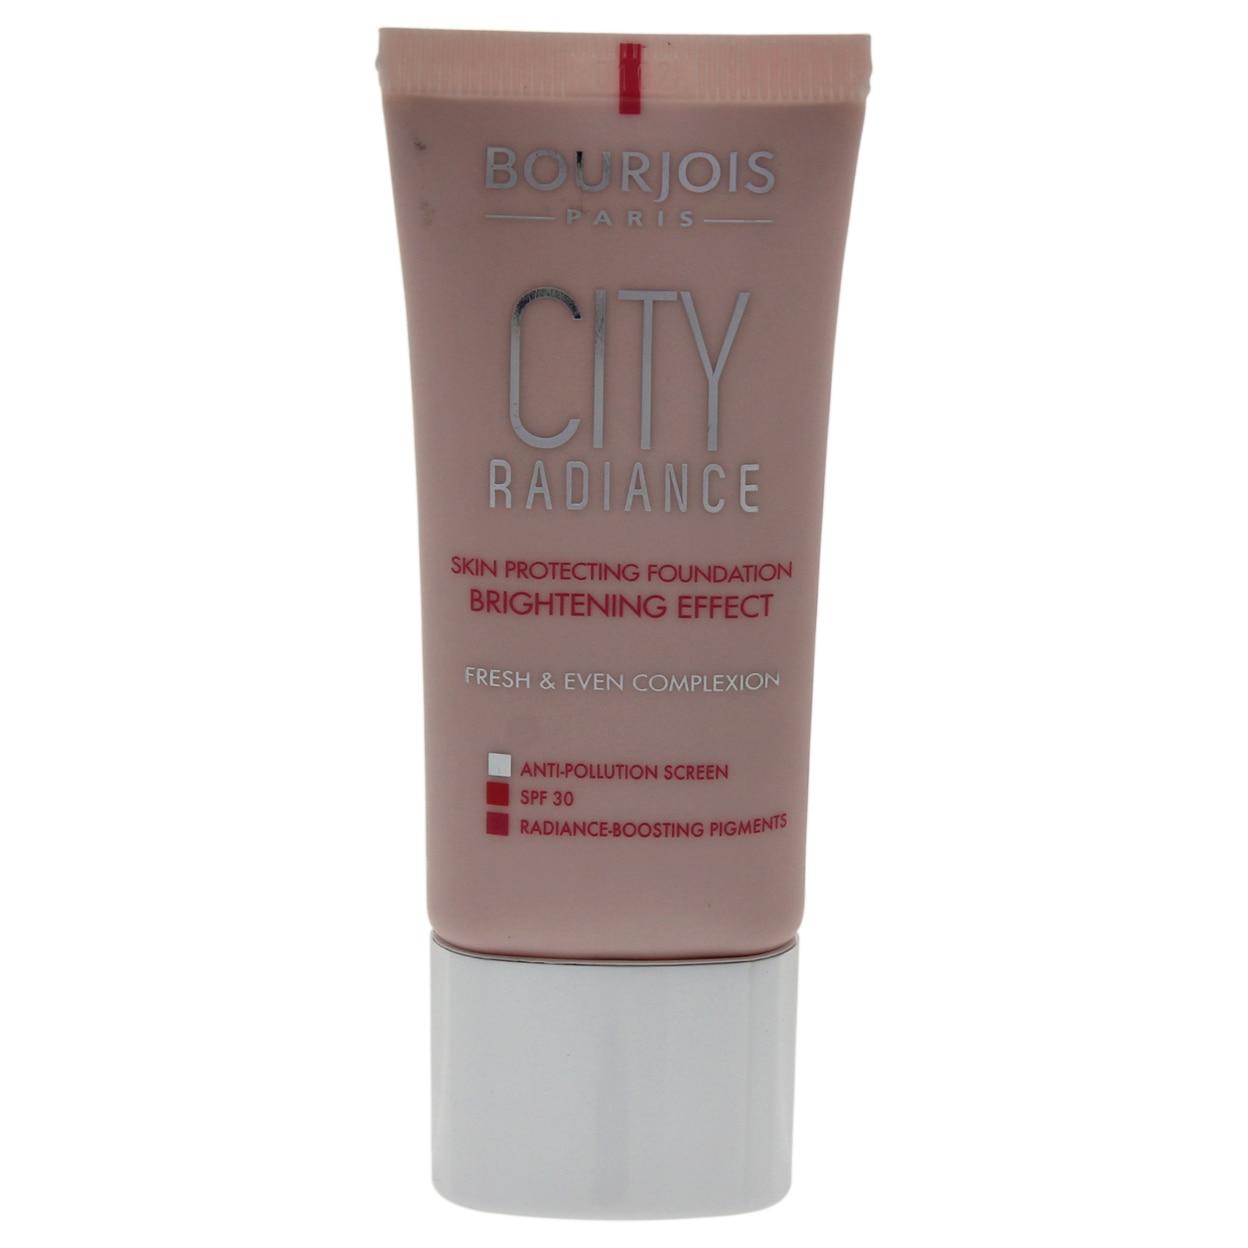 City Radiance Skin Protecting Foundation SPF 30 - # 04 Beige de Bourjois para Mujeres - 1 oz Foundation bourjois foundation